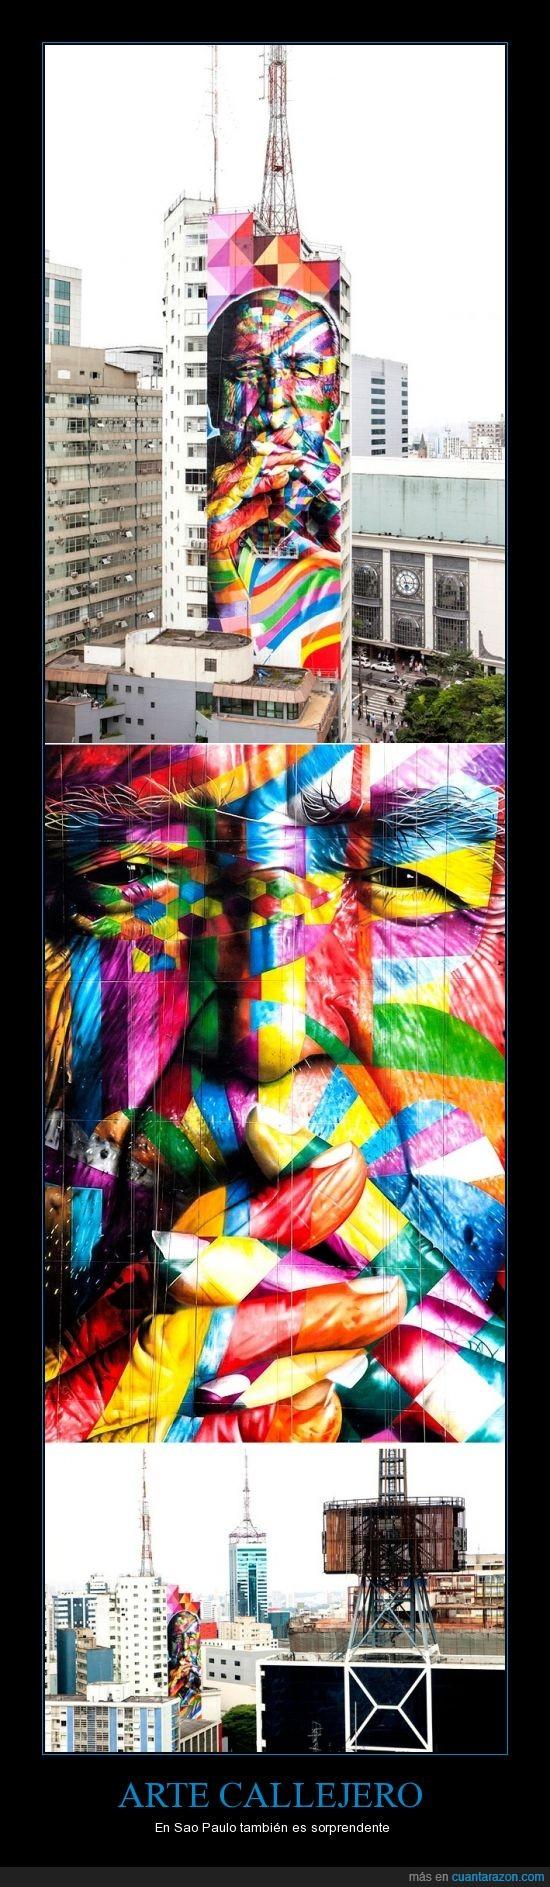 arte,brasil,calle,graffiti,sao paulo